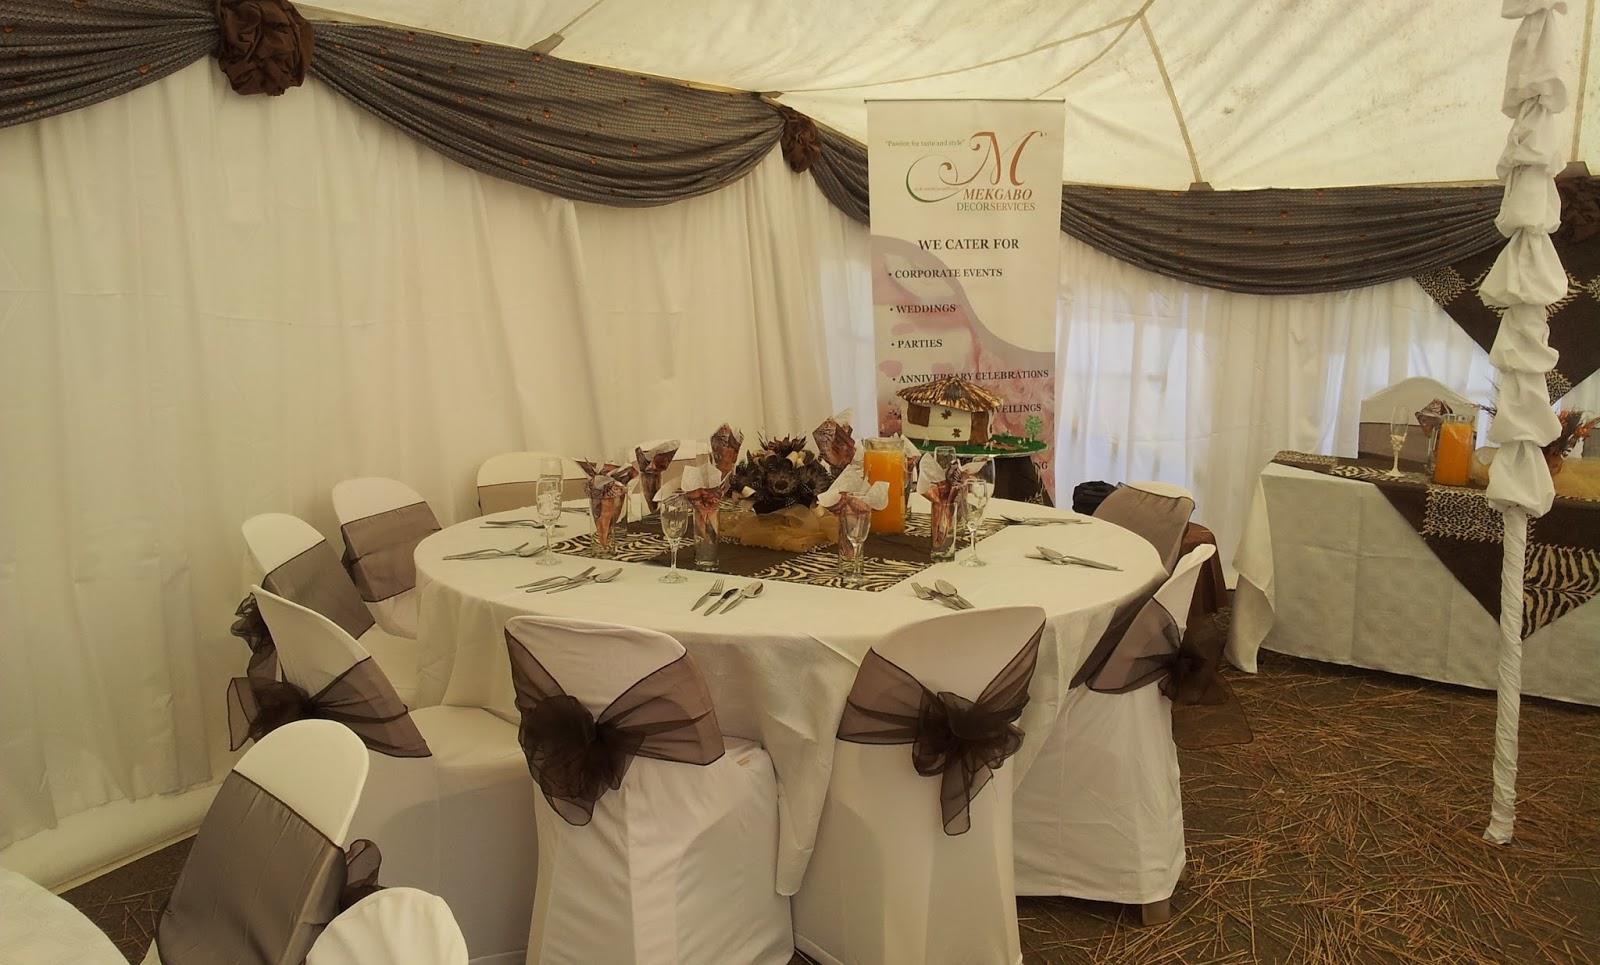 Tshepi 39 s traditional wedding mekgabo decor services for Traditional wedding decor ideas